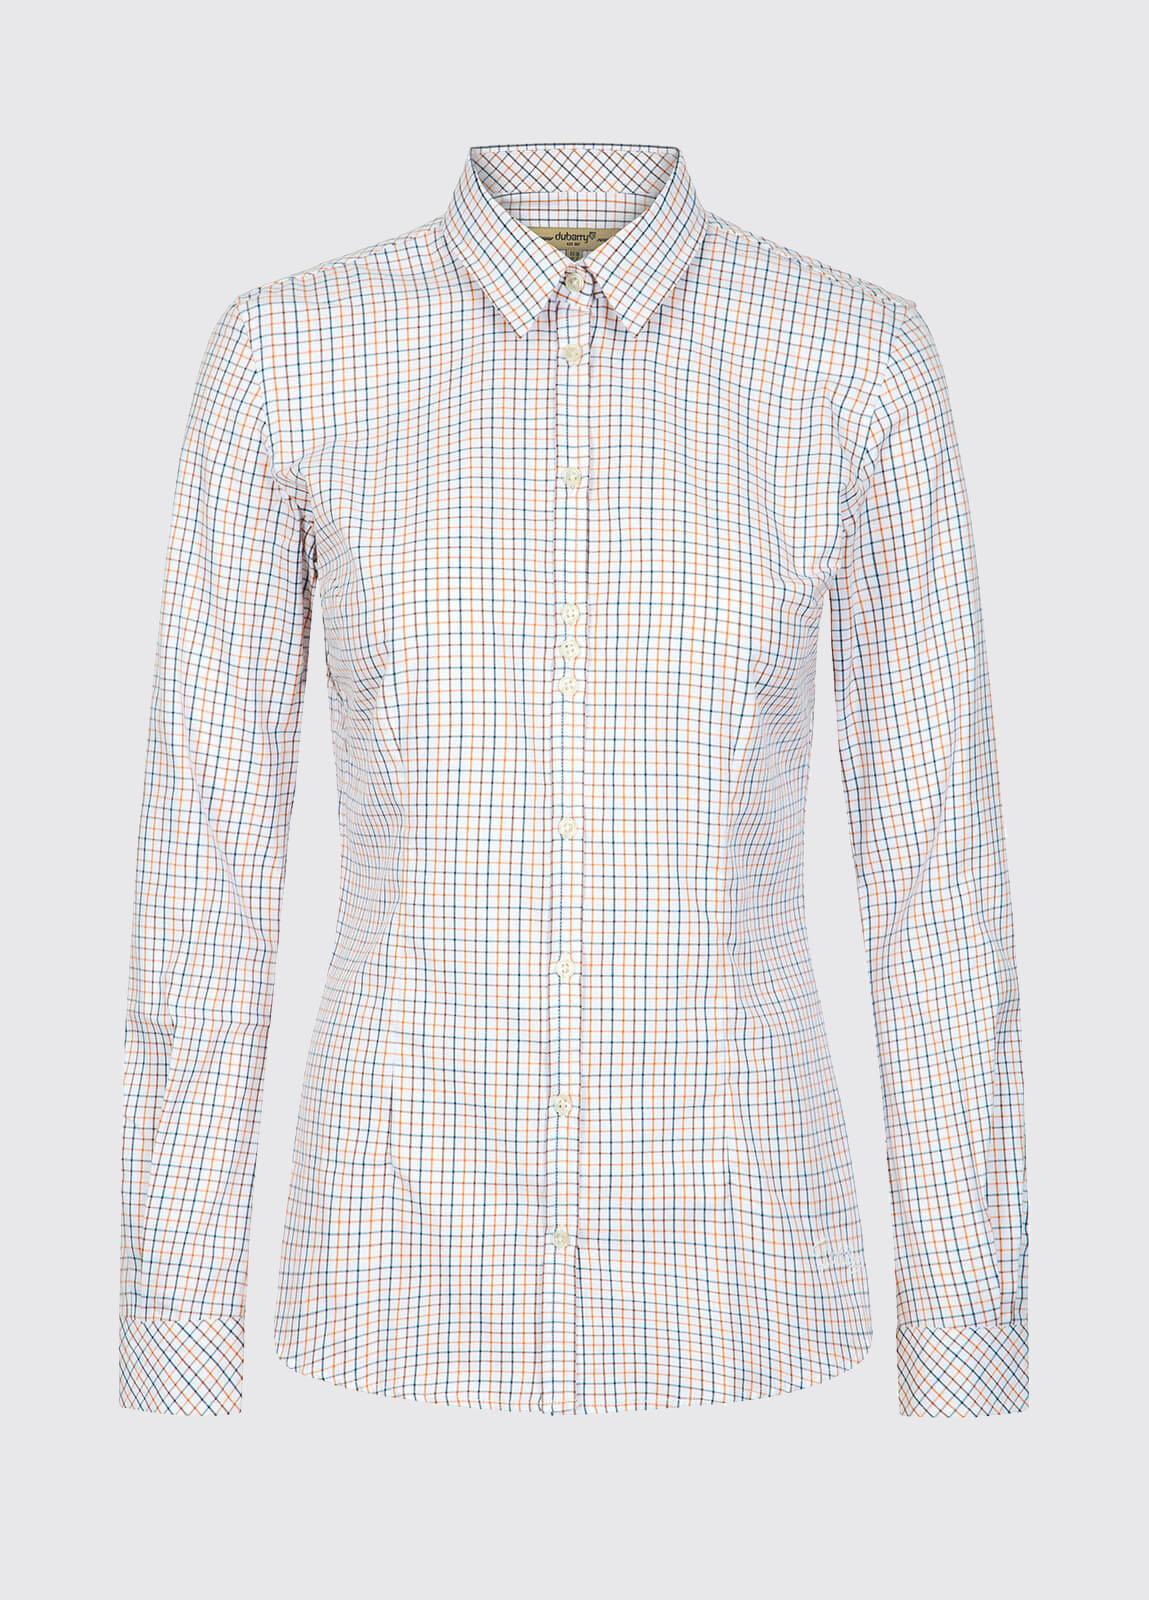 Elderflower Women's Shirt - Brown Multi